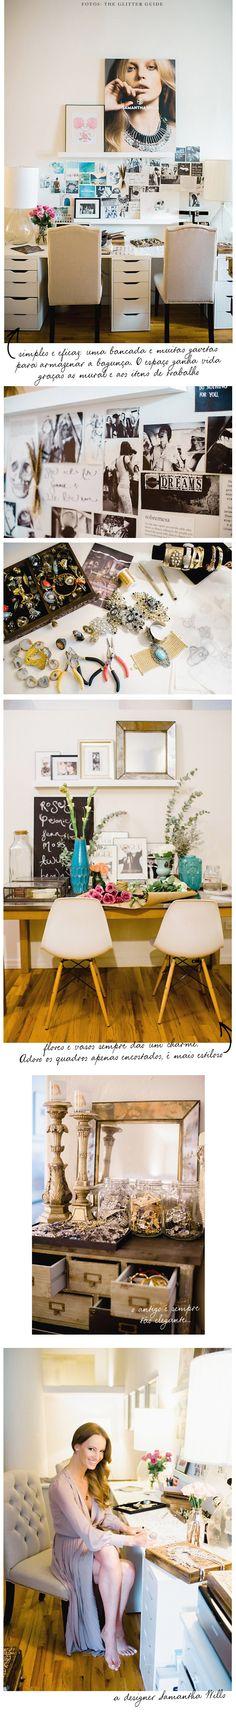 living-gazette-barbara-resende-escritorio-designer-joias